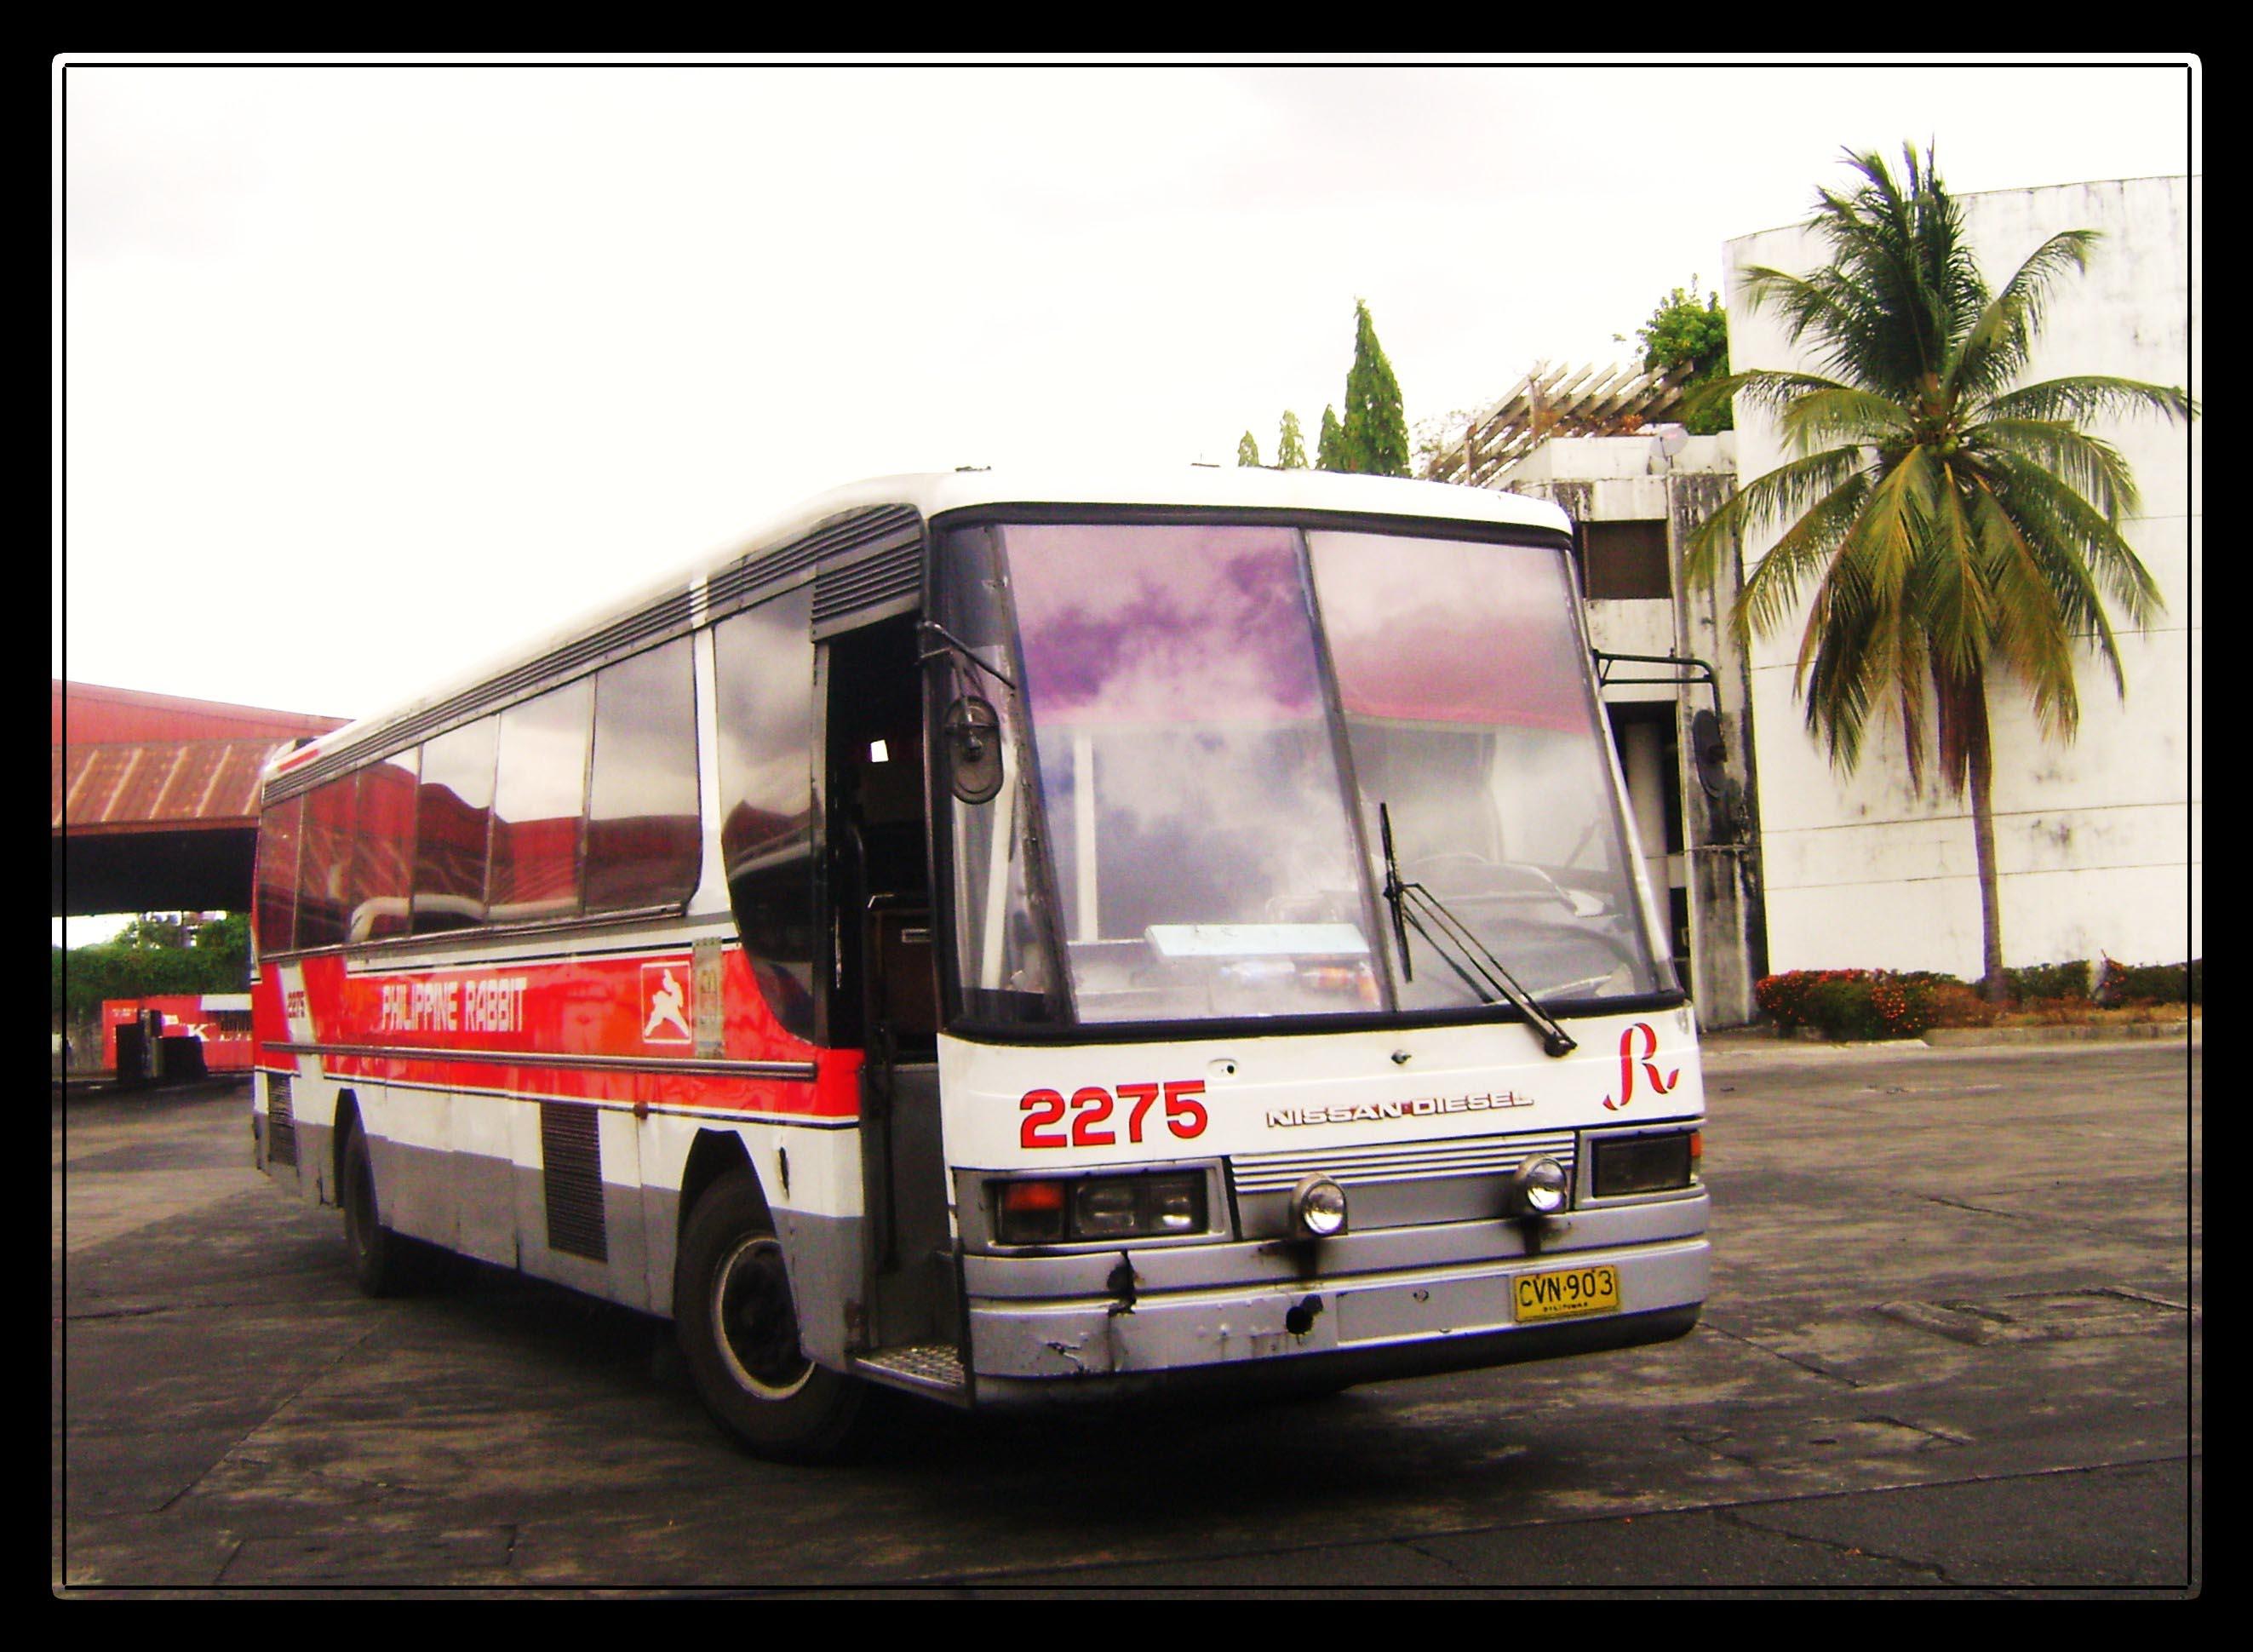 Amazing Coelho Nissan Diesel Santarosa Flexibilidade Ud Filipino Pe6 2275 Prbl Rb31s